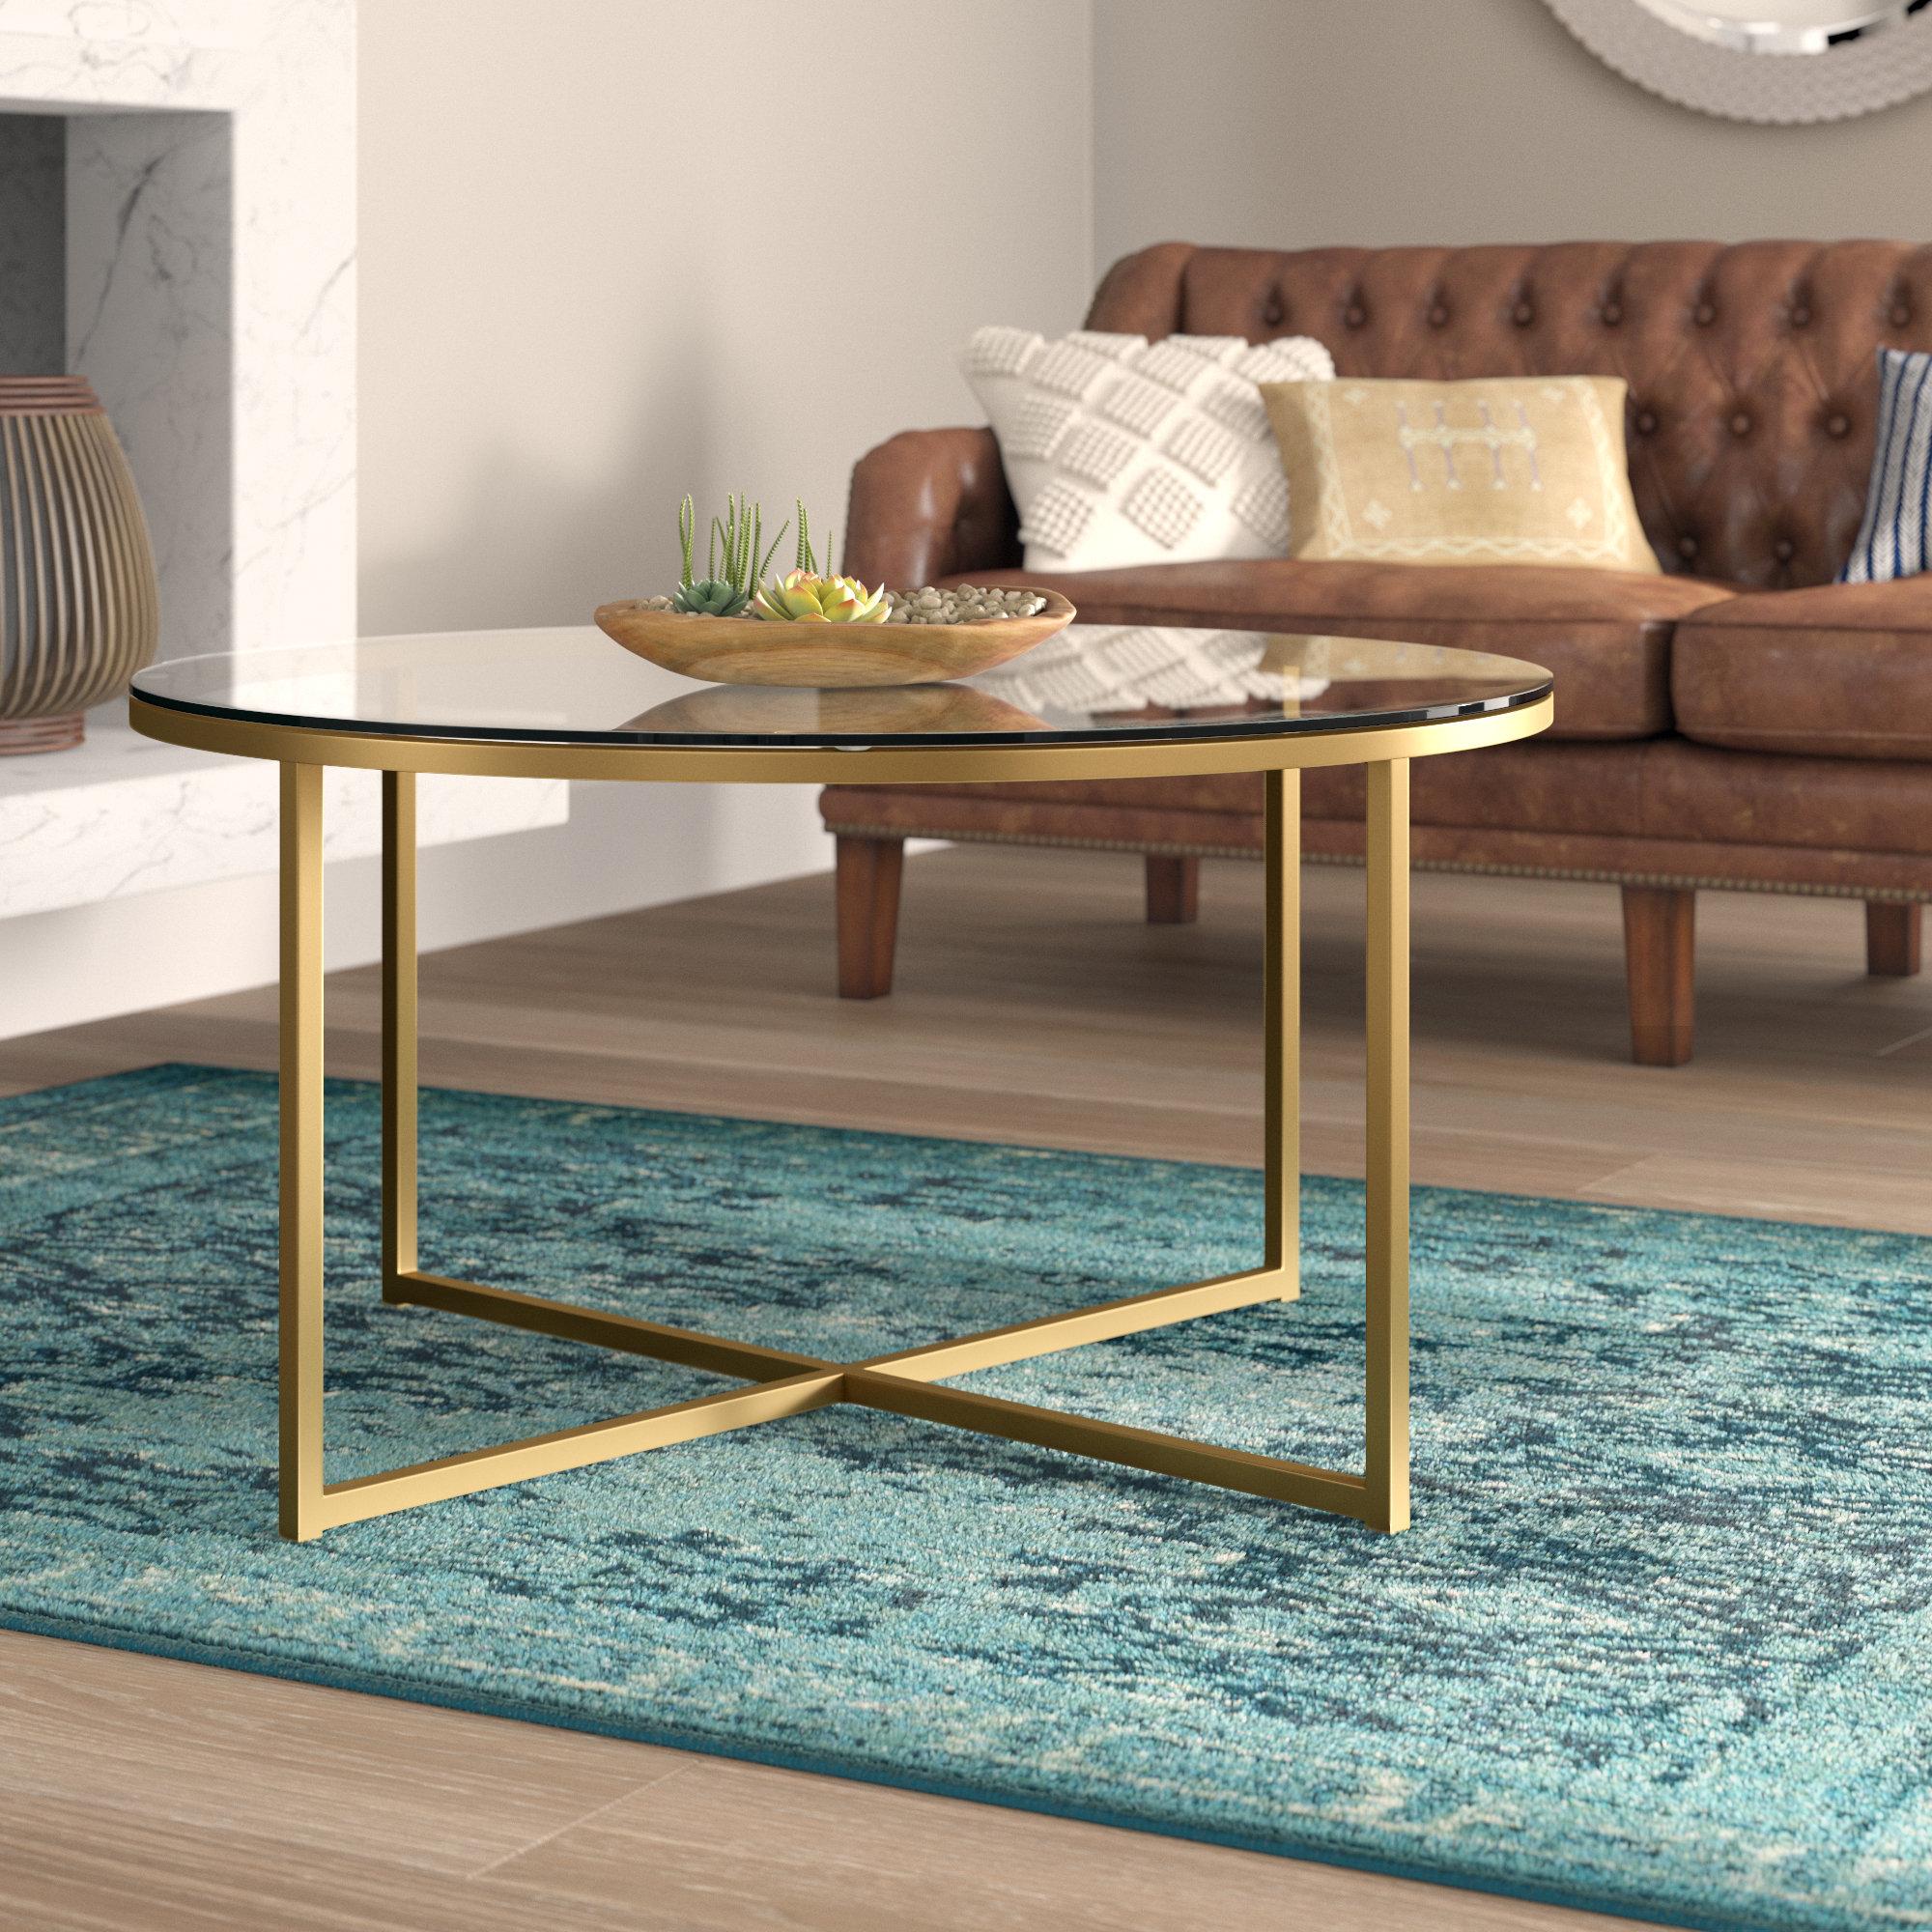 Mercer41 Zara Coffee Table With Tray Top Reviews Wayfair